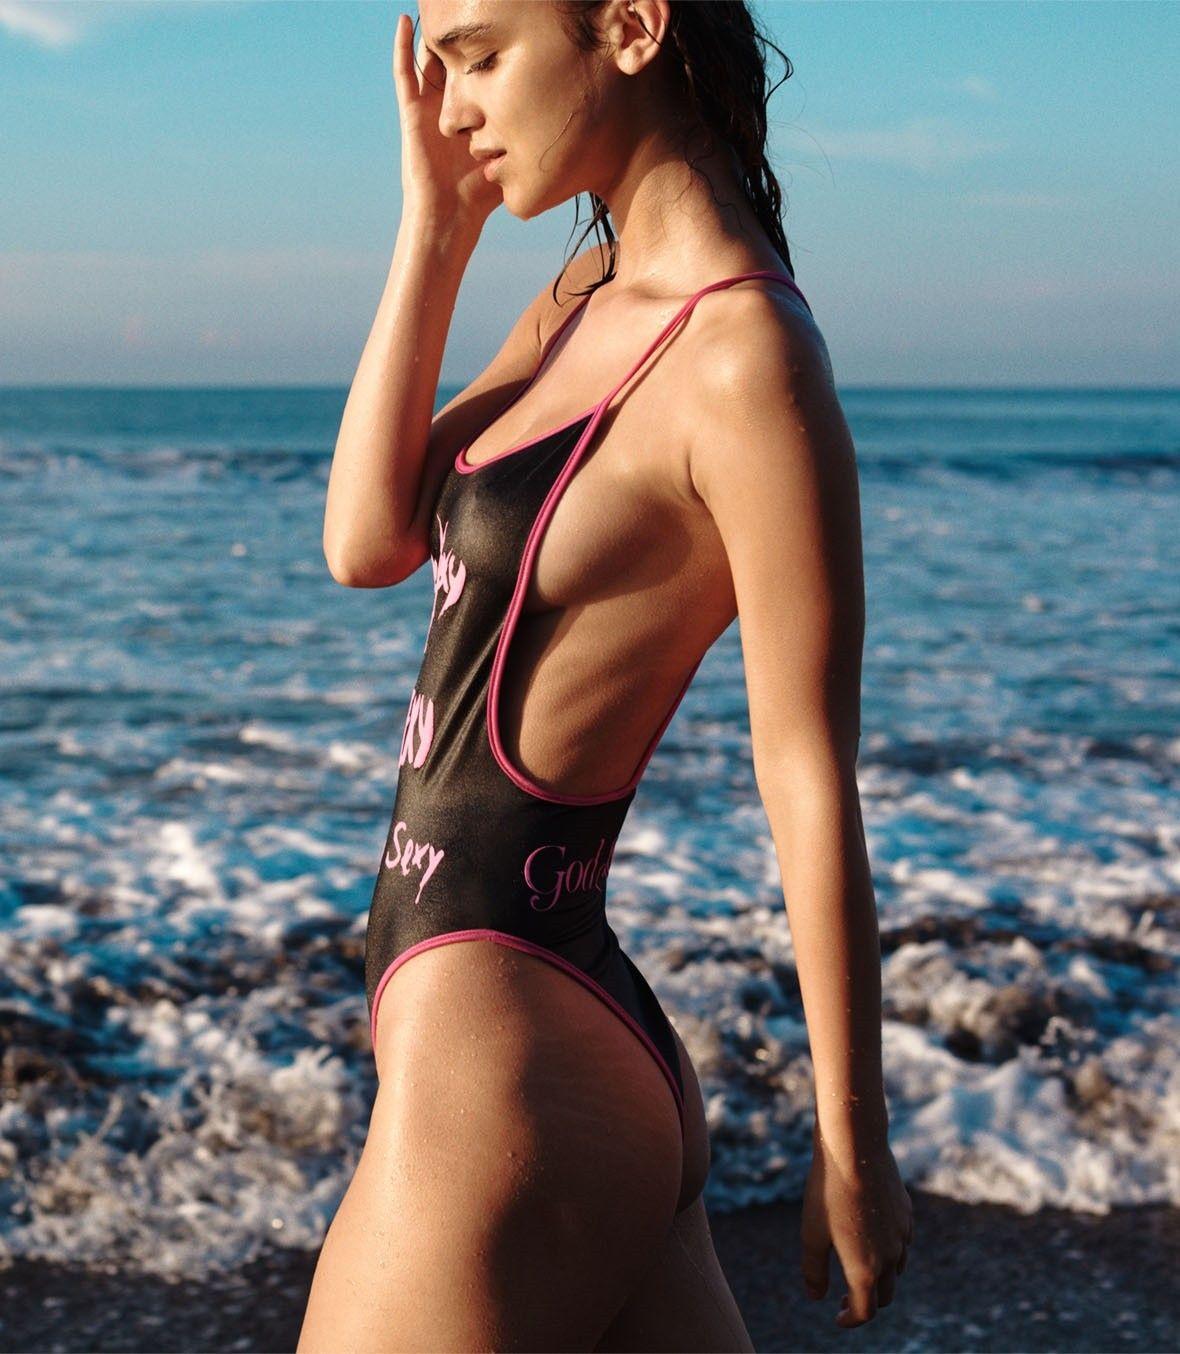 Sideboobs Hannah Brooks nudes (57 photos), Topless, Sideboobs, Twitter, in bikini 2019